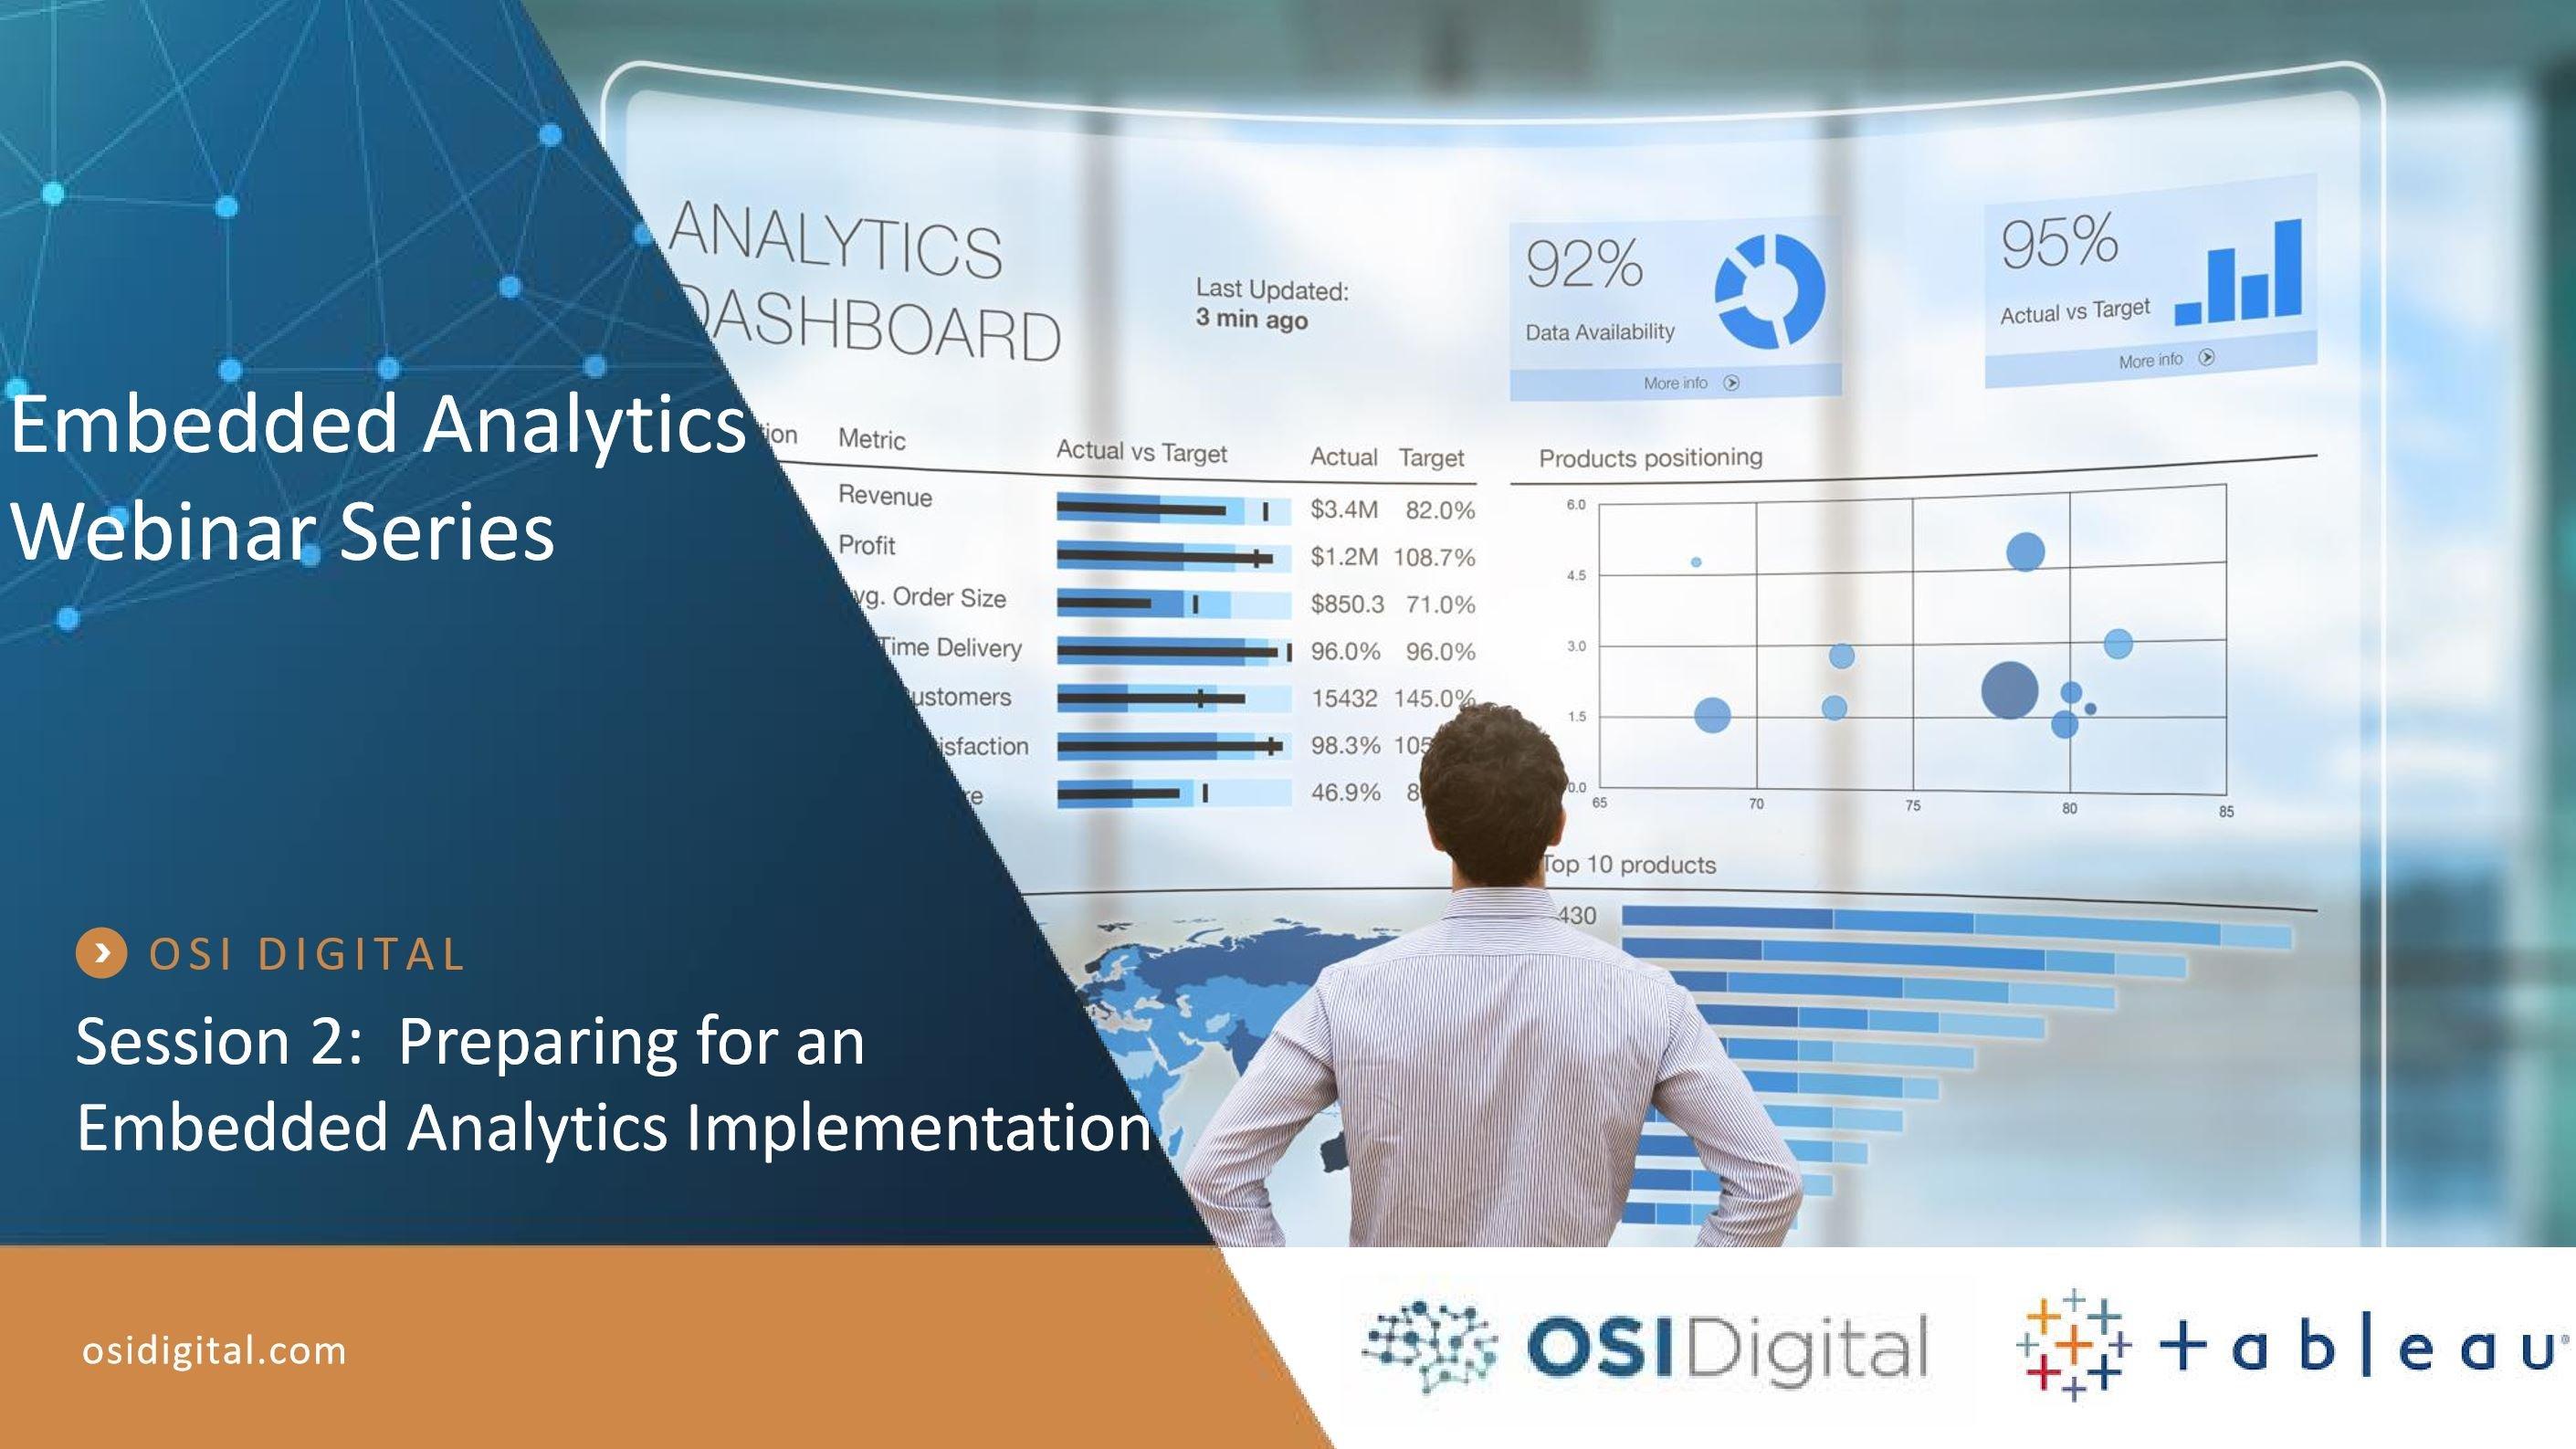 Embedded Analytics Webinar Session 2 - Cover Image